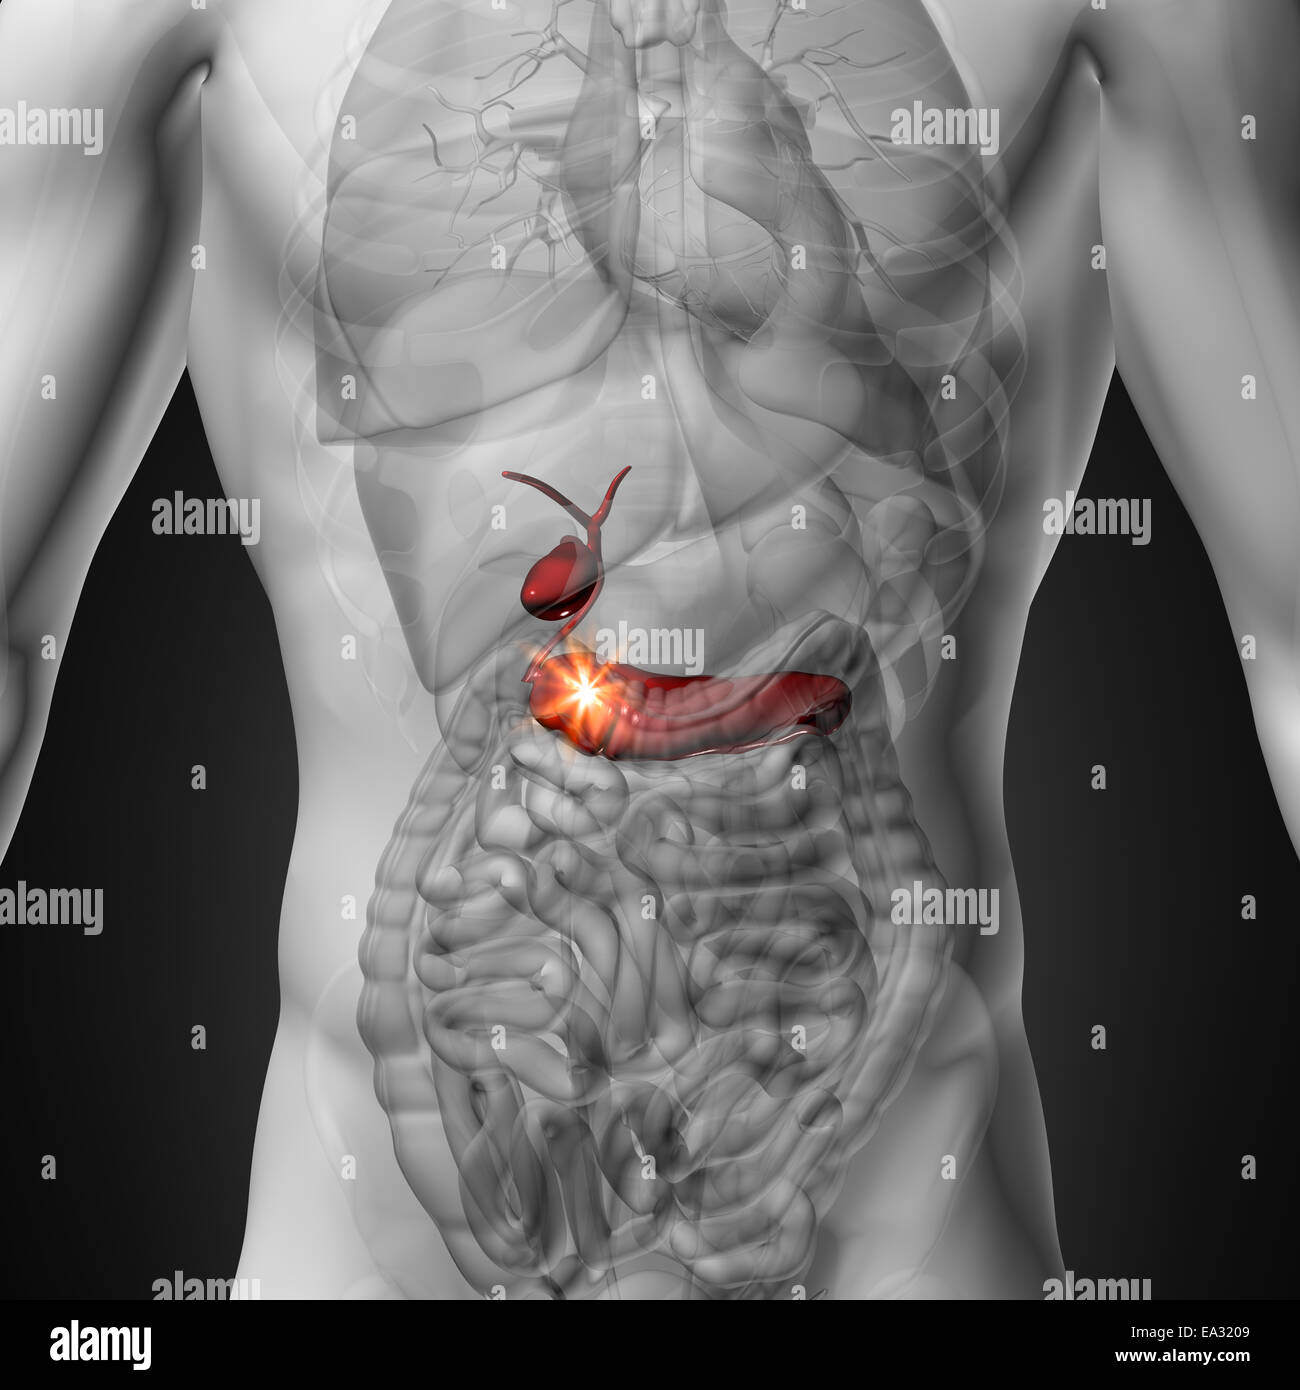 Gallbladder / Pancreas - Male anatomy of human organs - x-ray view ...